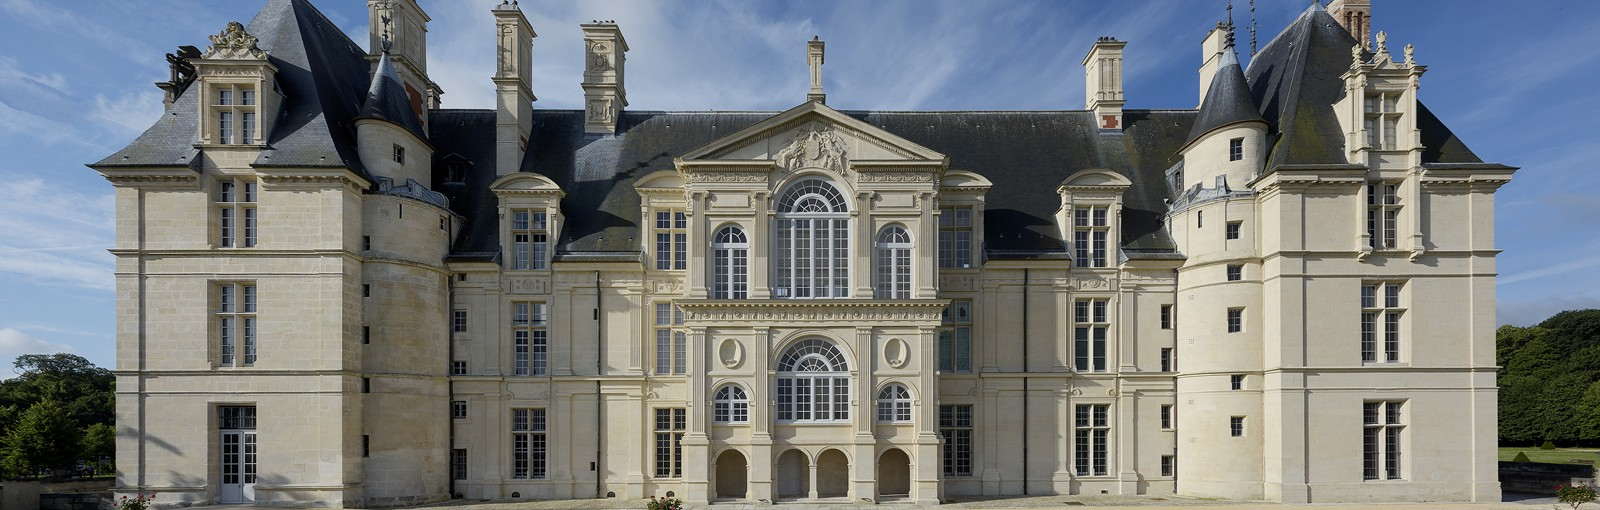 Tours Ecouen - Medio-días - Excursiones desde París